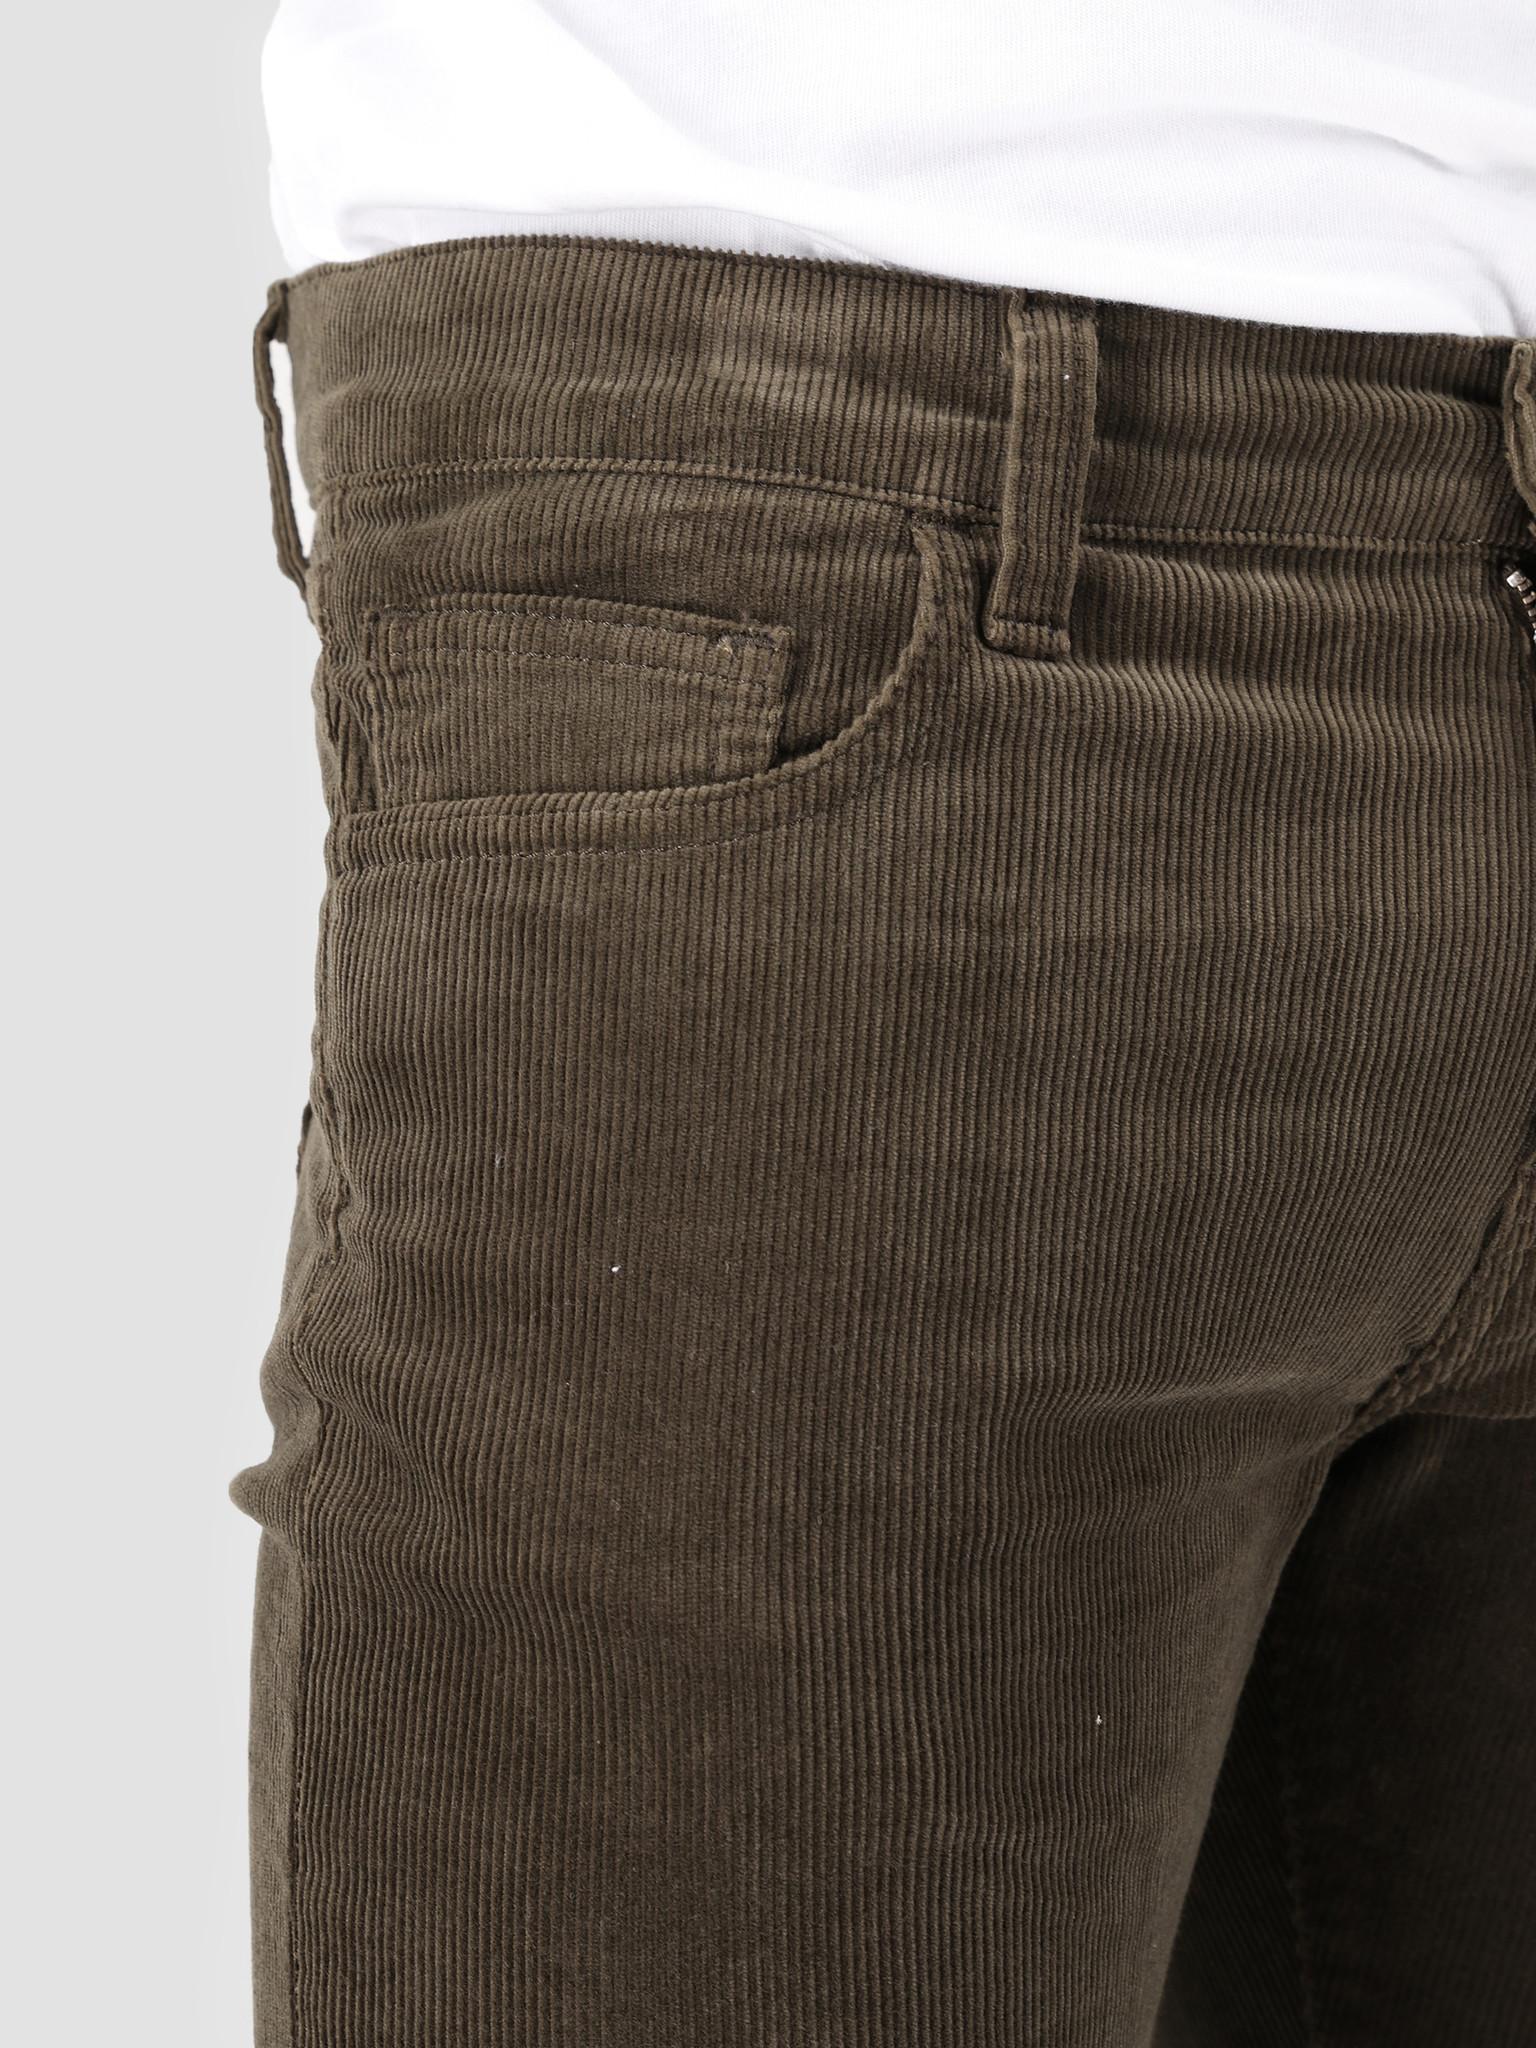 Carhartt WIP Carhartt WIP Rebel Pant Rinsed Cypress I025815